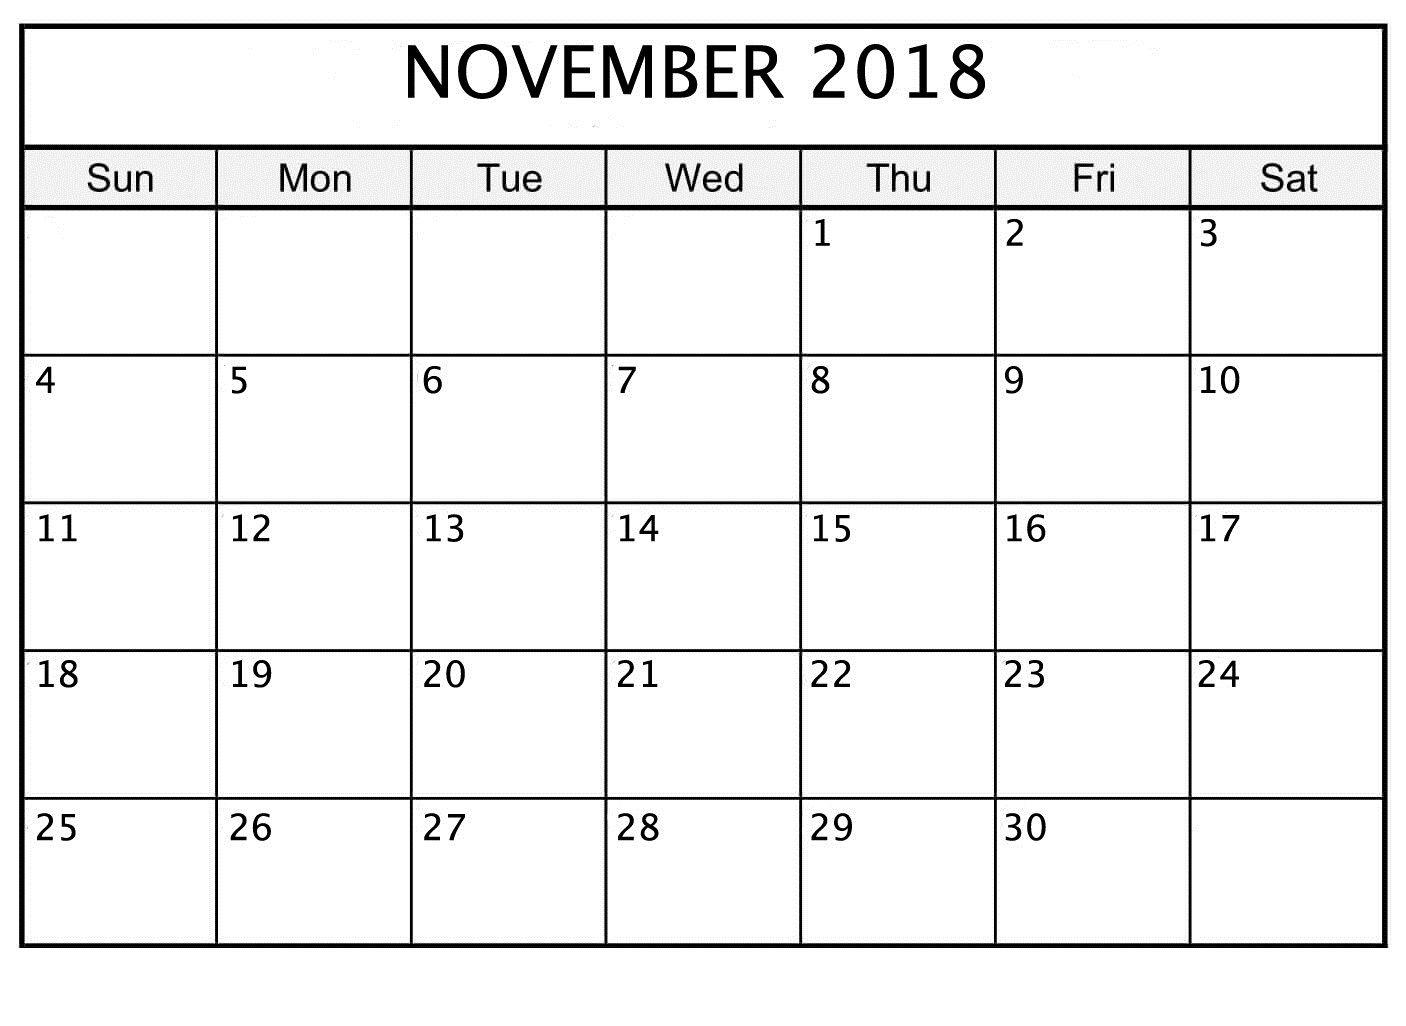 November 2018 Printable Calendar Date And Time | November